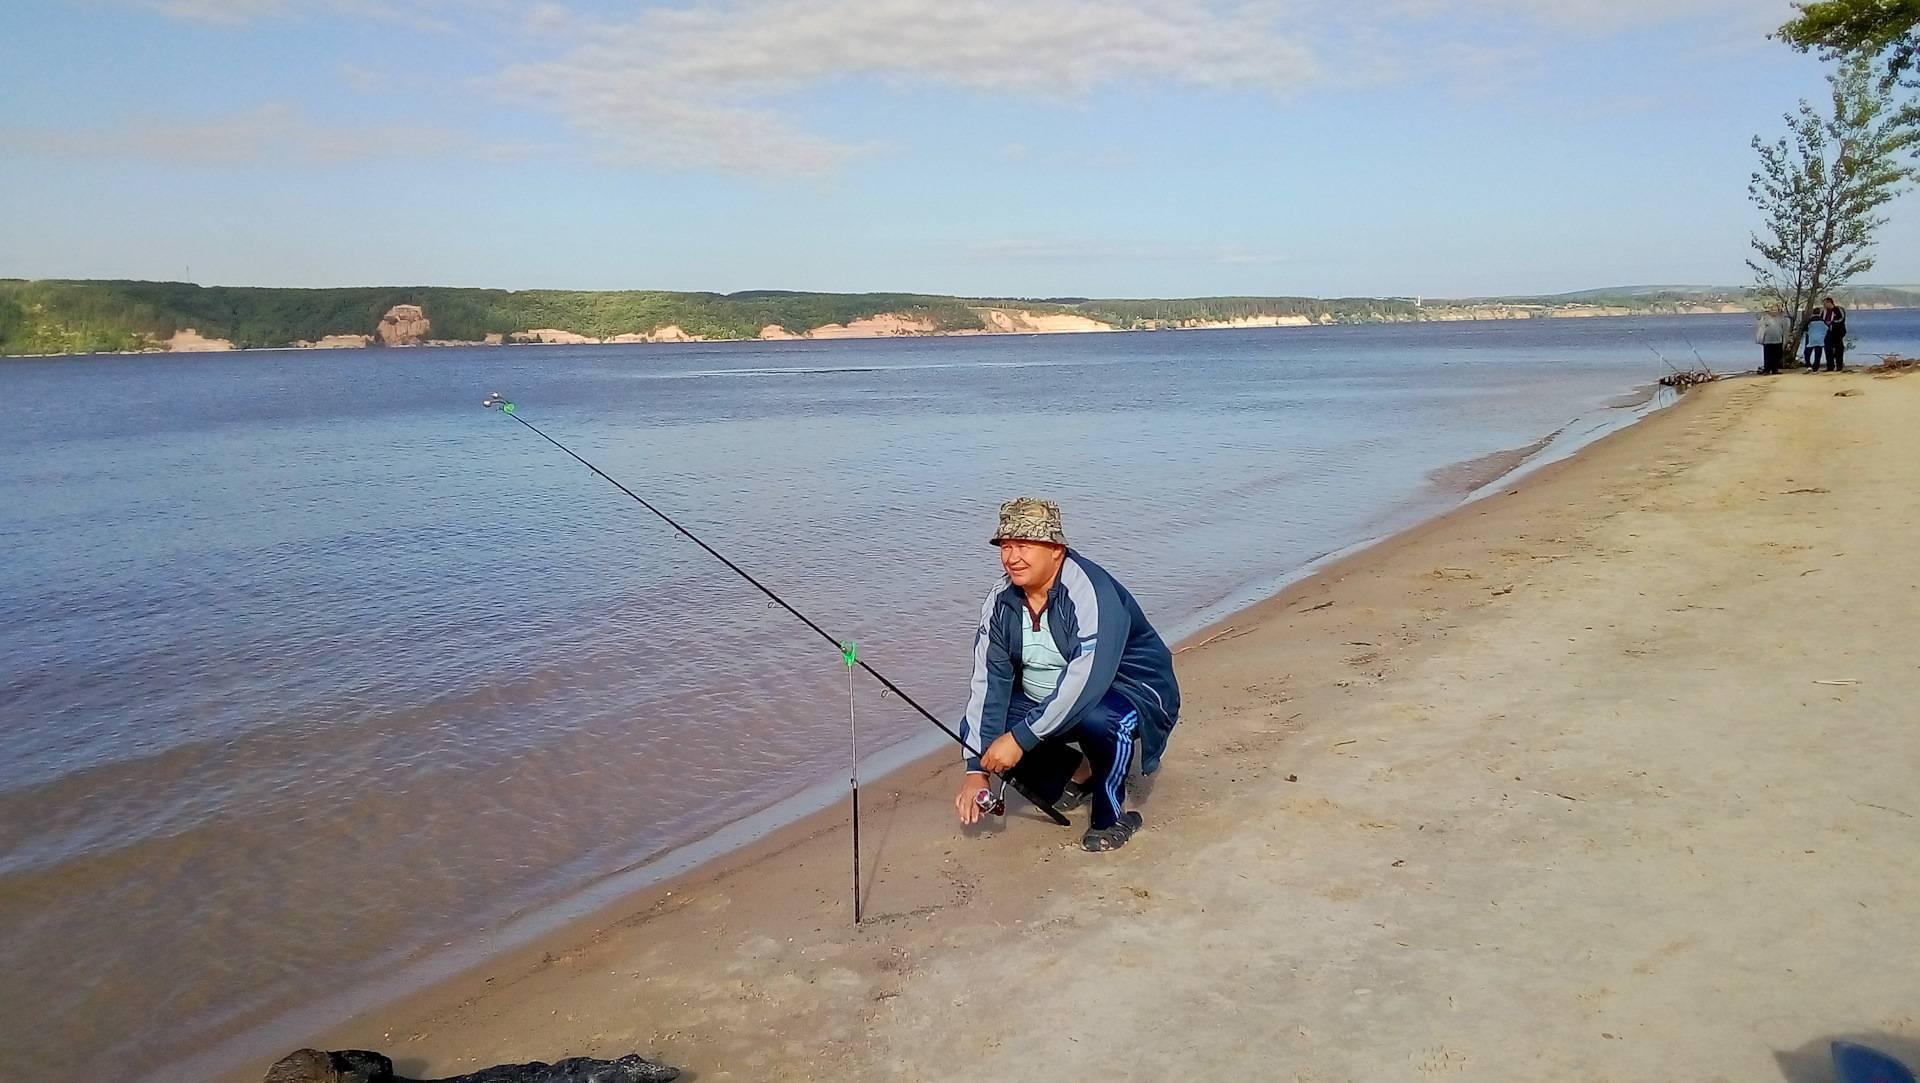 Рыбалка на пенопласт и детали подготовки снасти. ловля на пенопласт — выбор снасти и прикормки